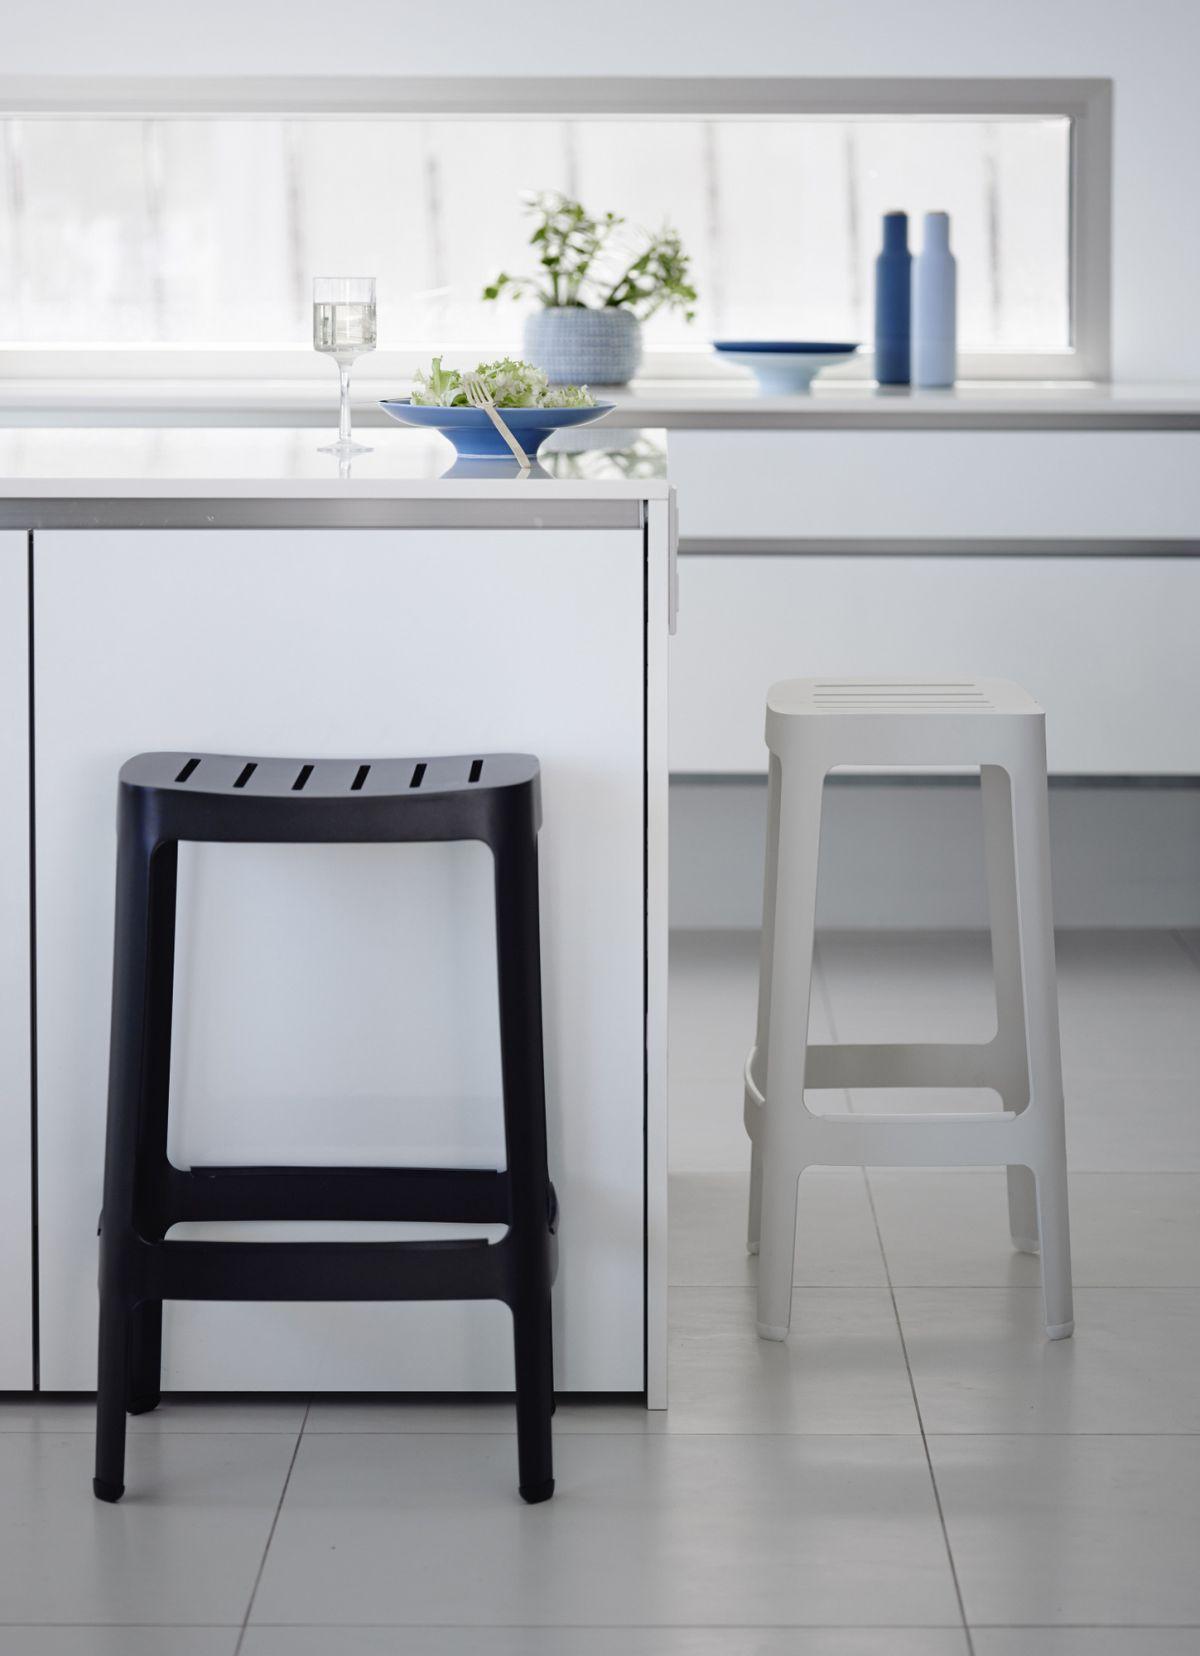 black white bar stools choose use kitchen high chairs Cut black kitchen bar stool